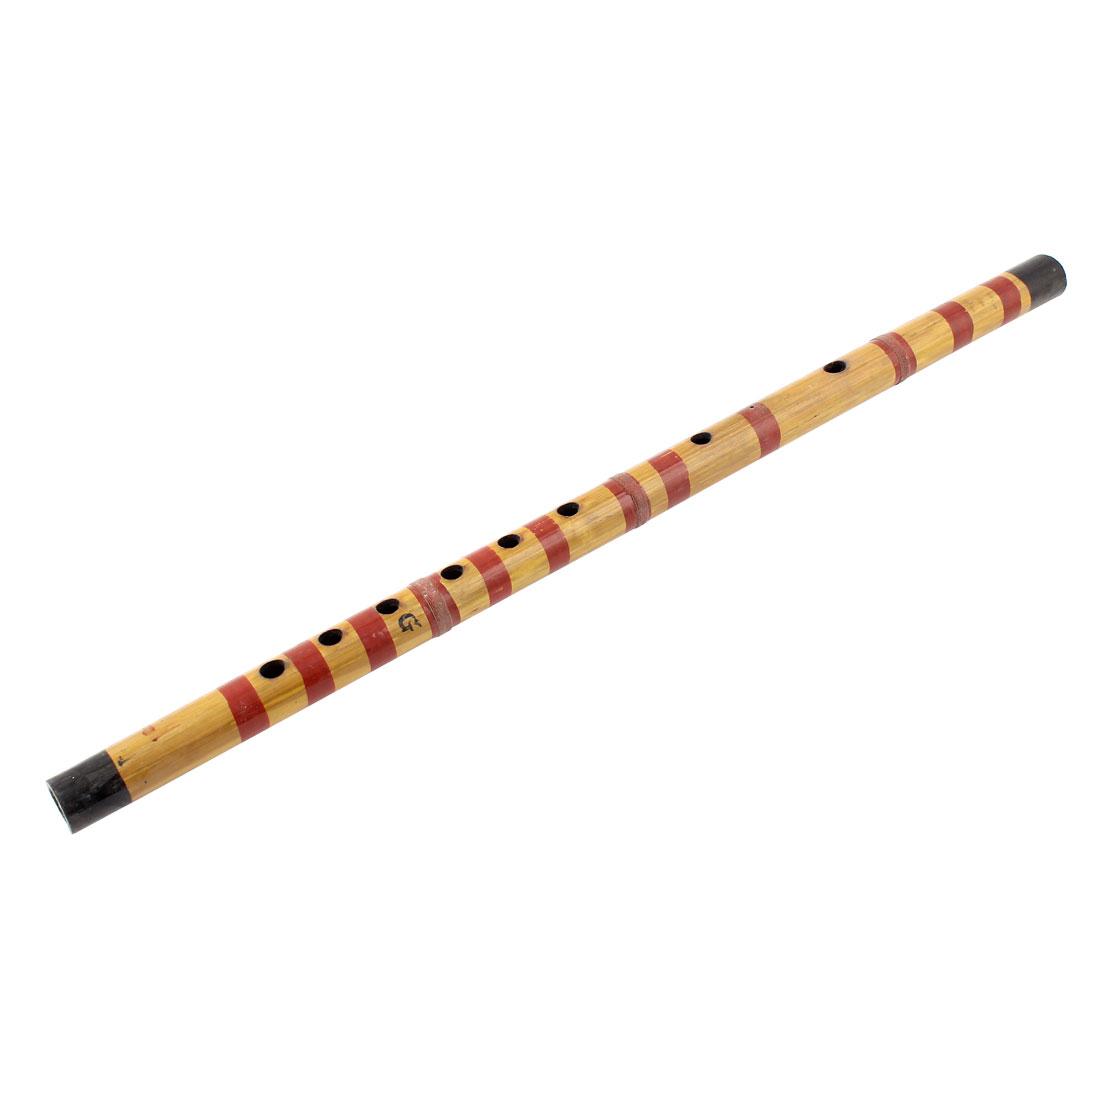 Musical Instrument Soprano G Tune 10 Holes Music Chinese Bamboo Flute